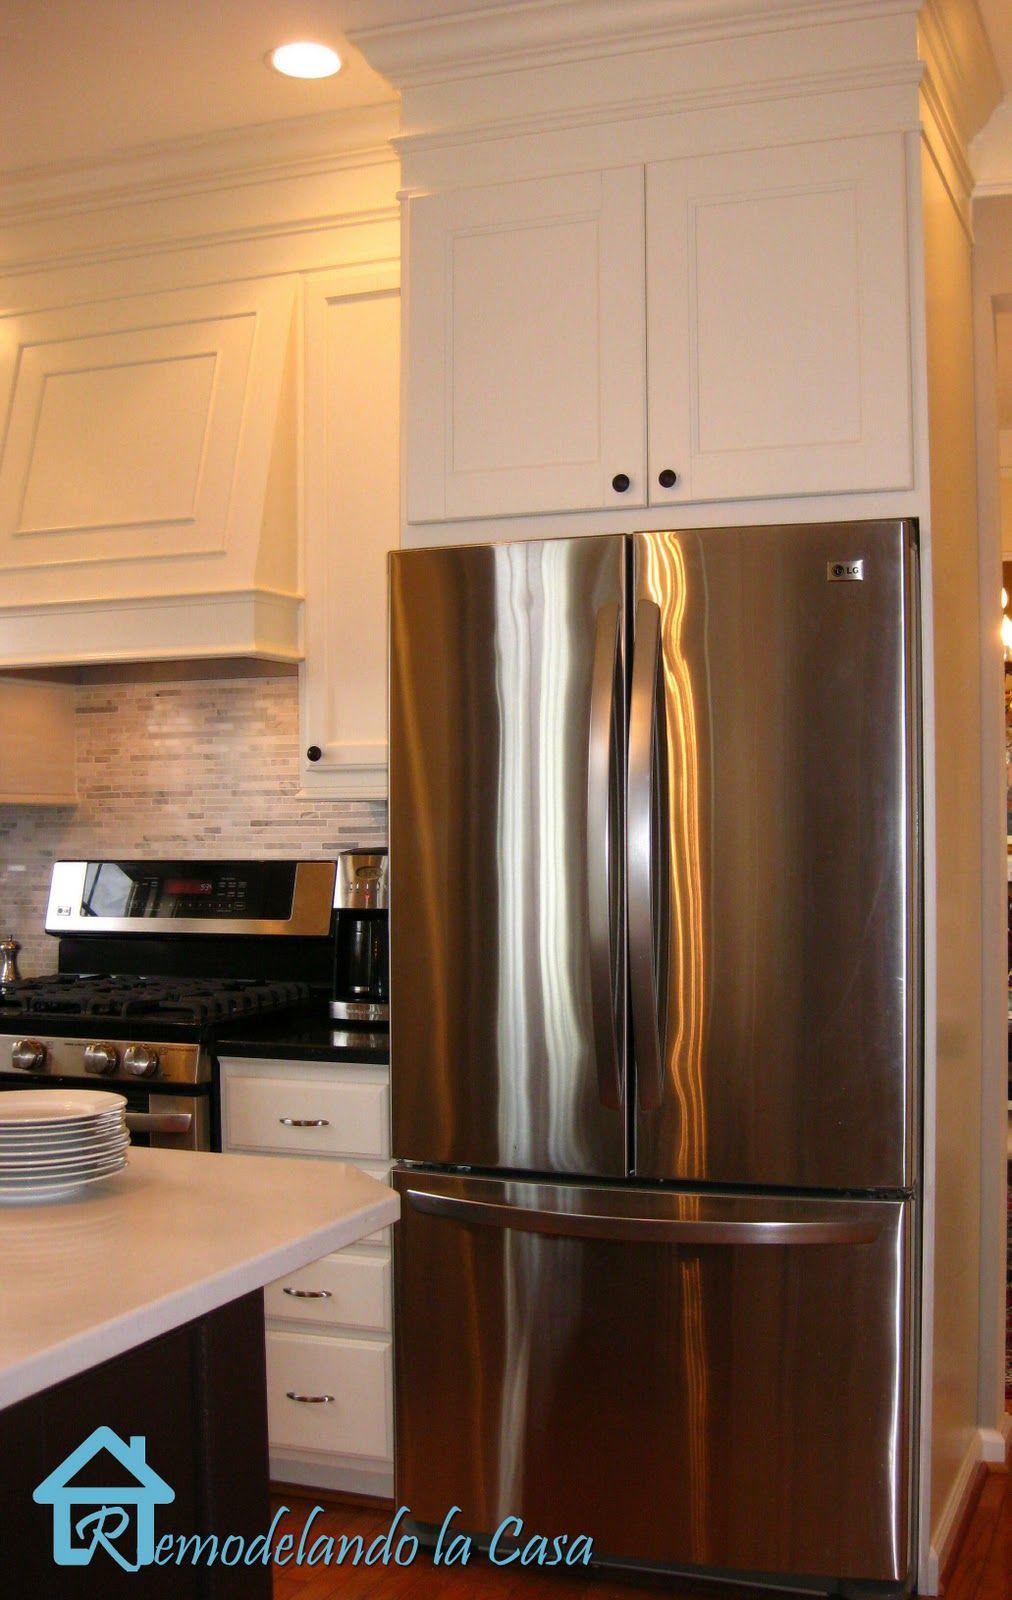 Building the Refrigerator Enclosure Kitchen redo